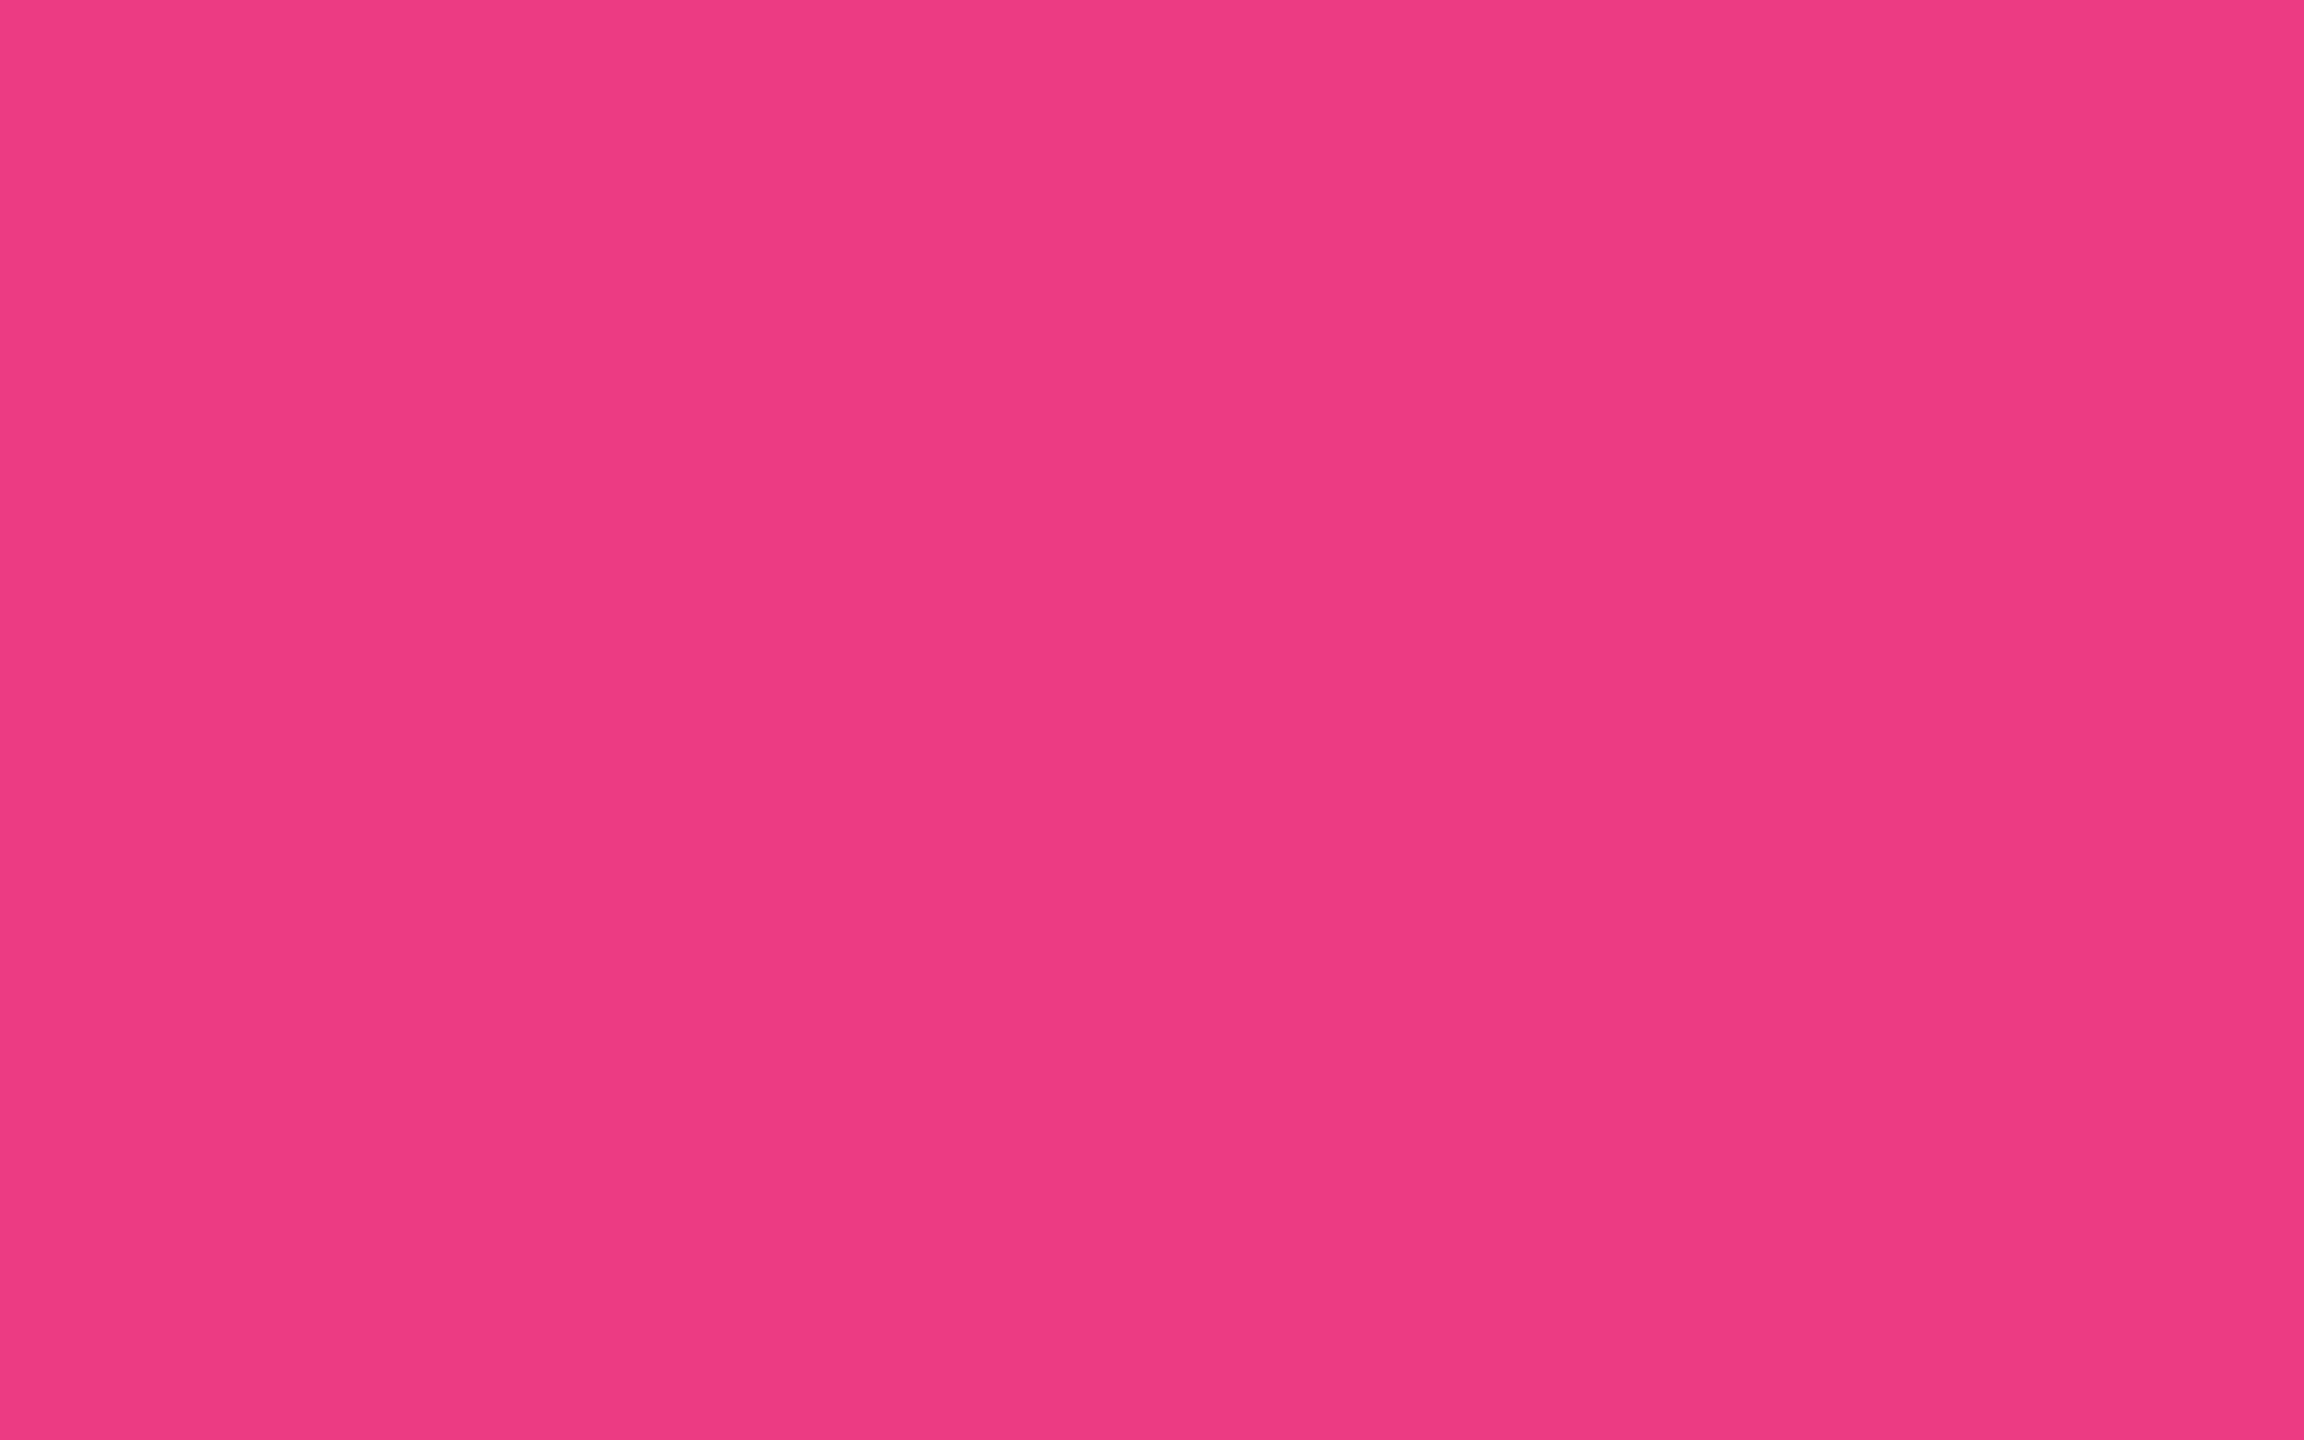 2304x1440 Cerise Pink Solid Color Background